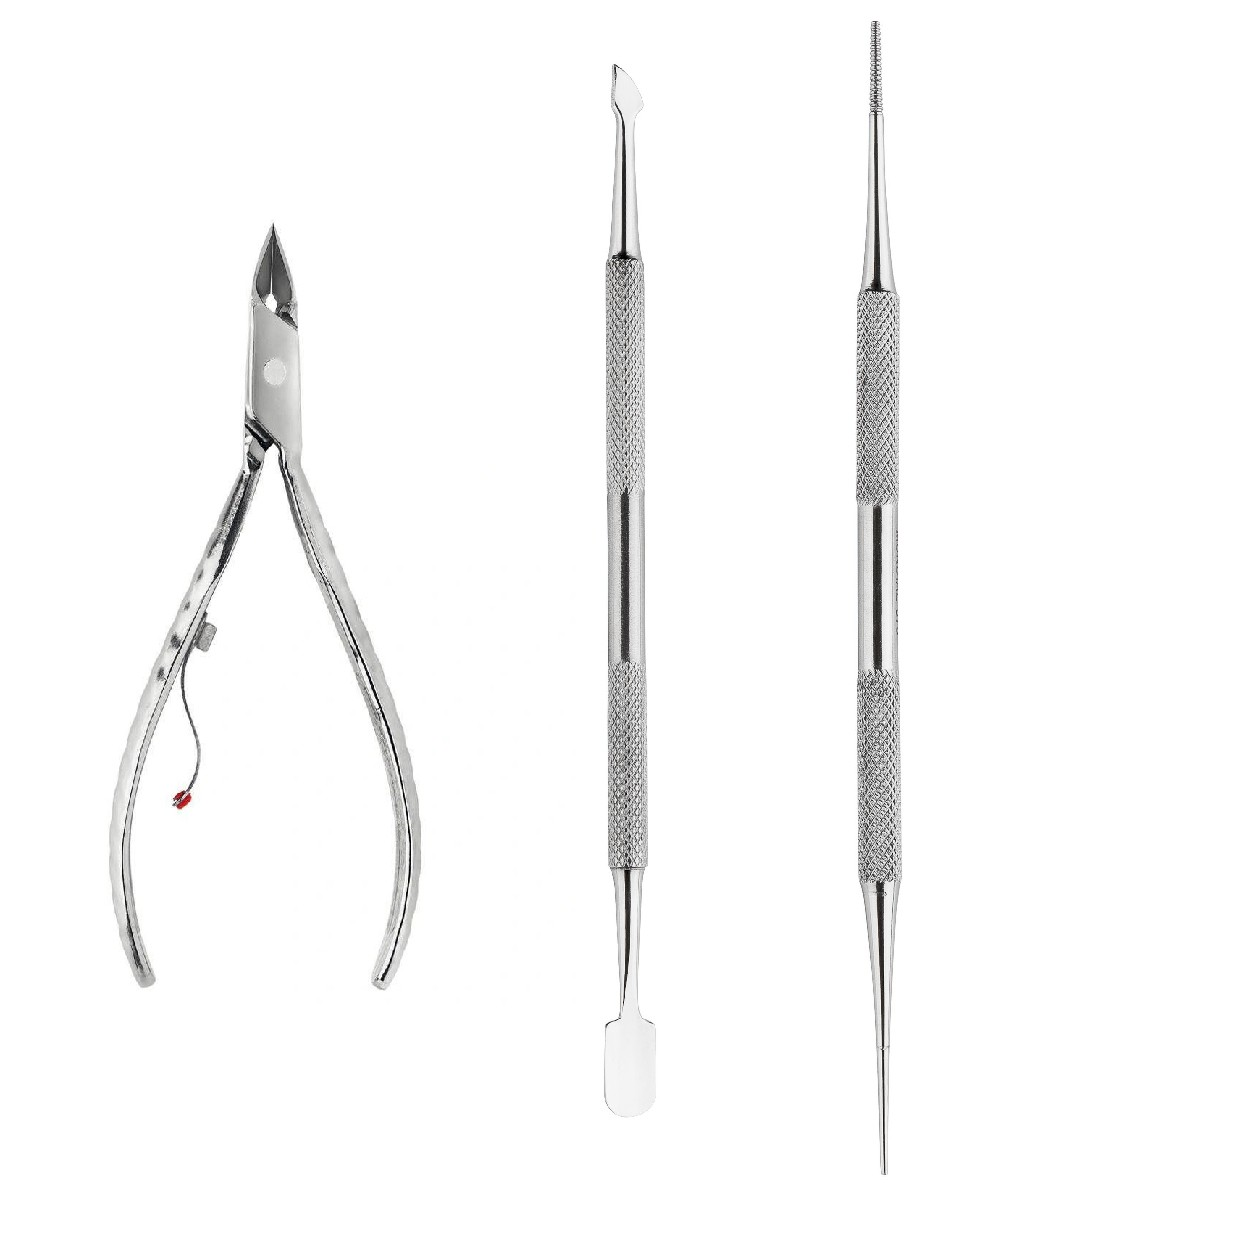 kit manicure Mundial profissional c/ Alicate de cutícula, Espátula de cutícula, Palito de unha inox